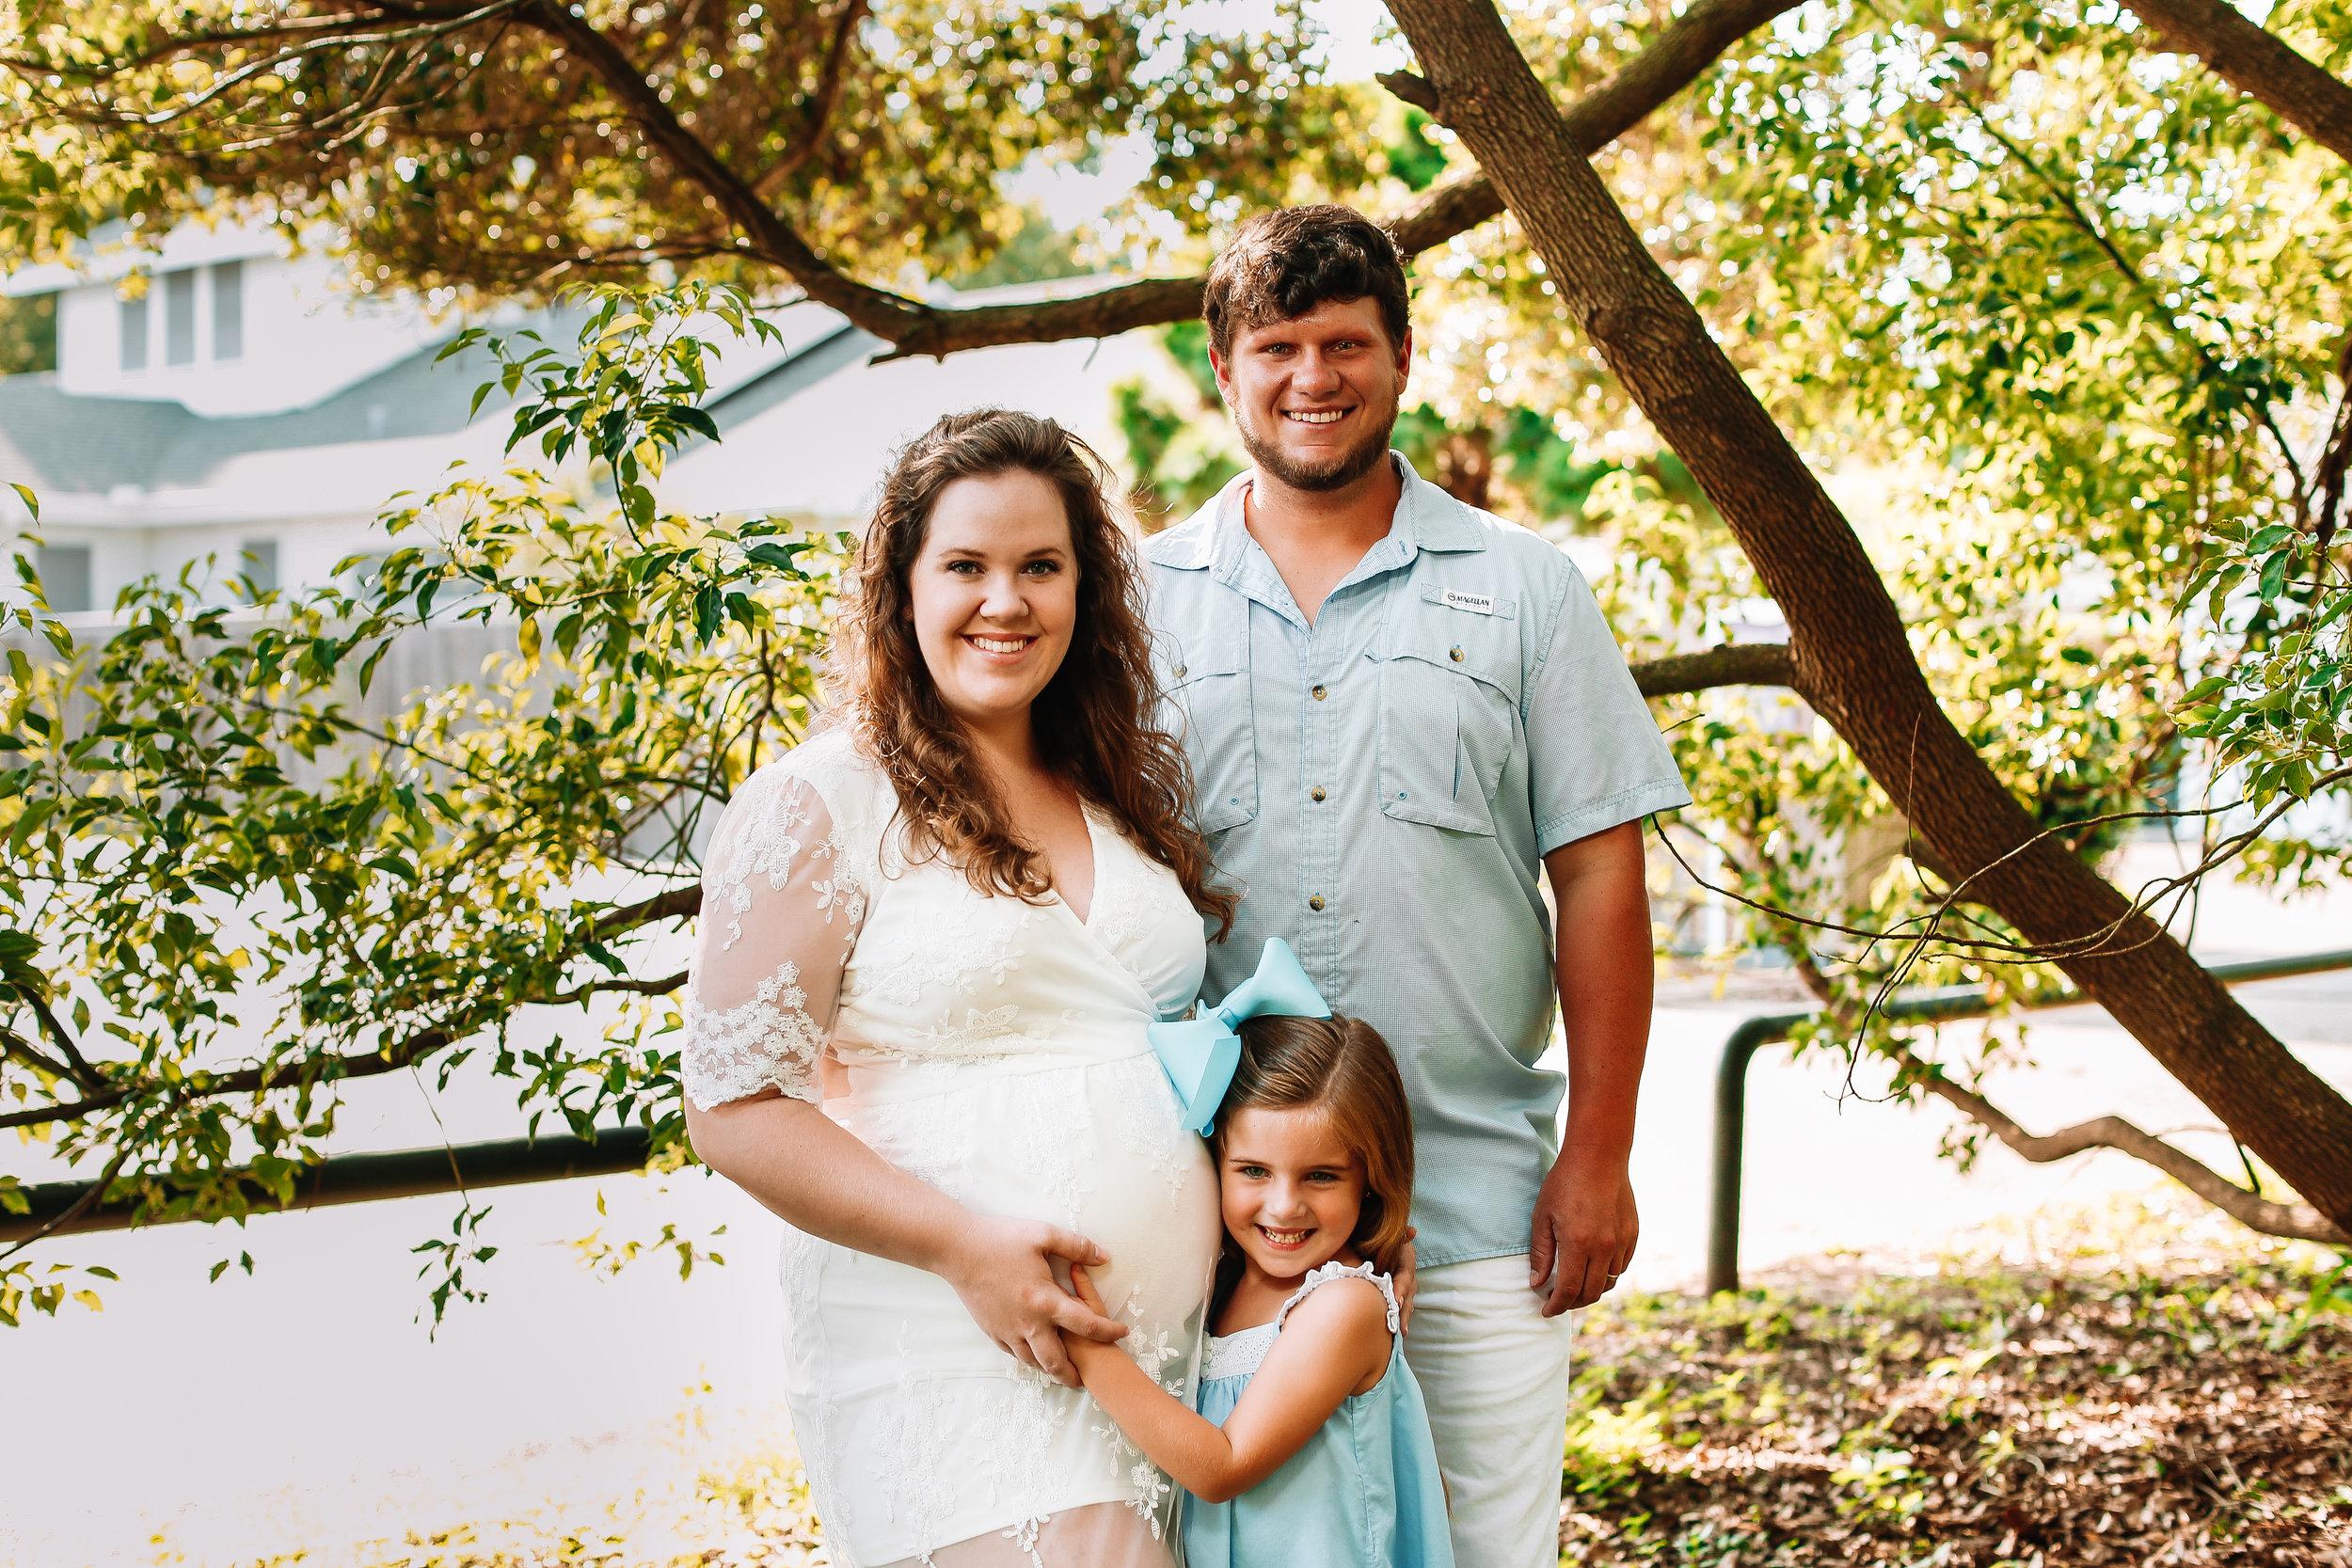 Family-Maternity-Photography-Lake-Charles